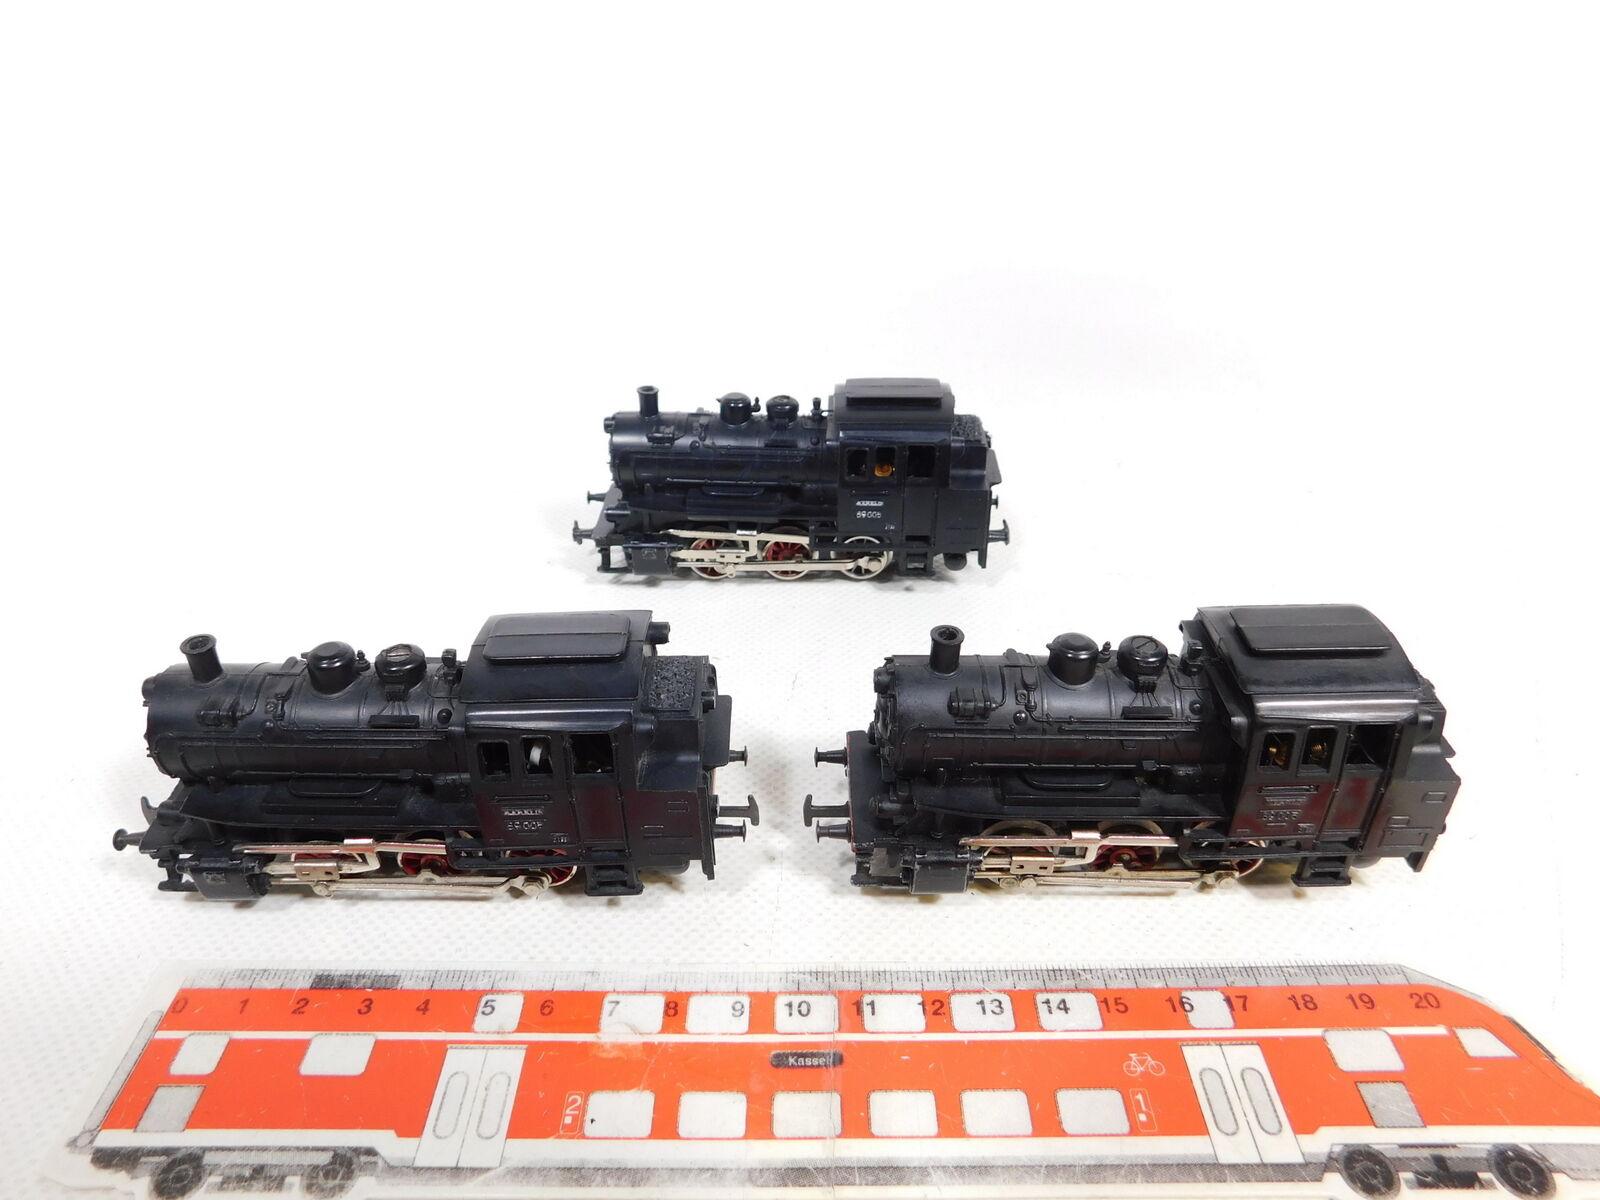 ce 444 - 1 1×3 x M?RKLIN H 0 / AC 3000テンダー/蒸気機関車/機関車